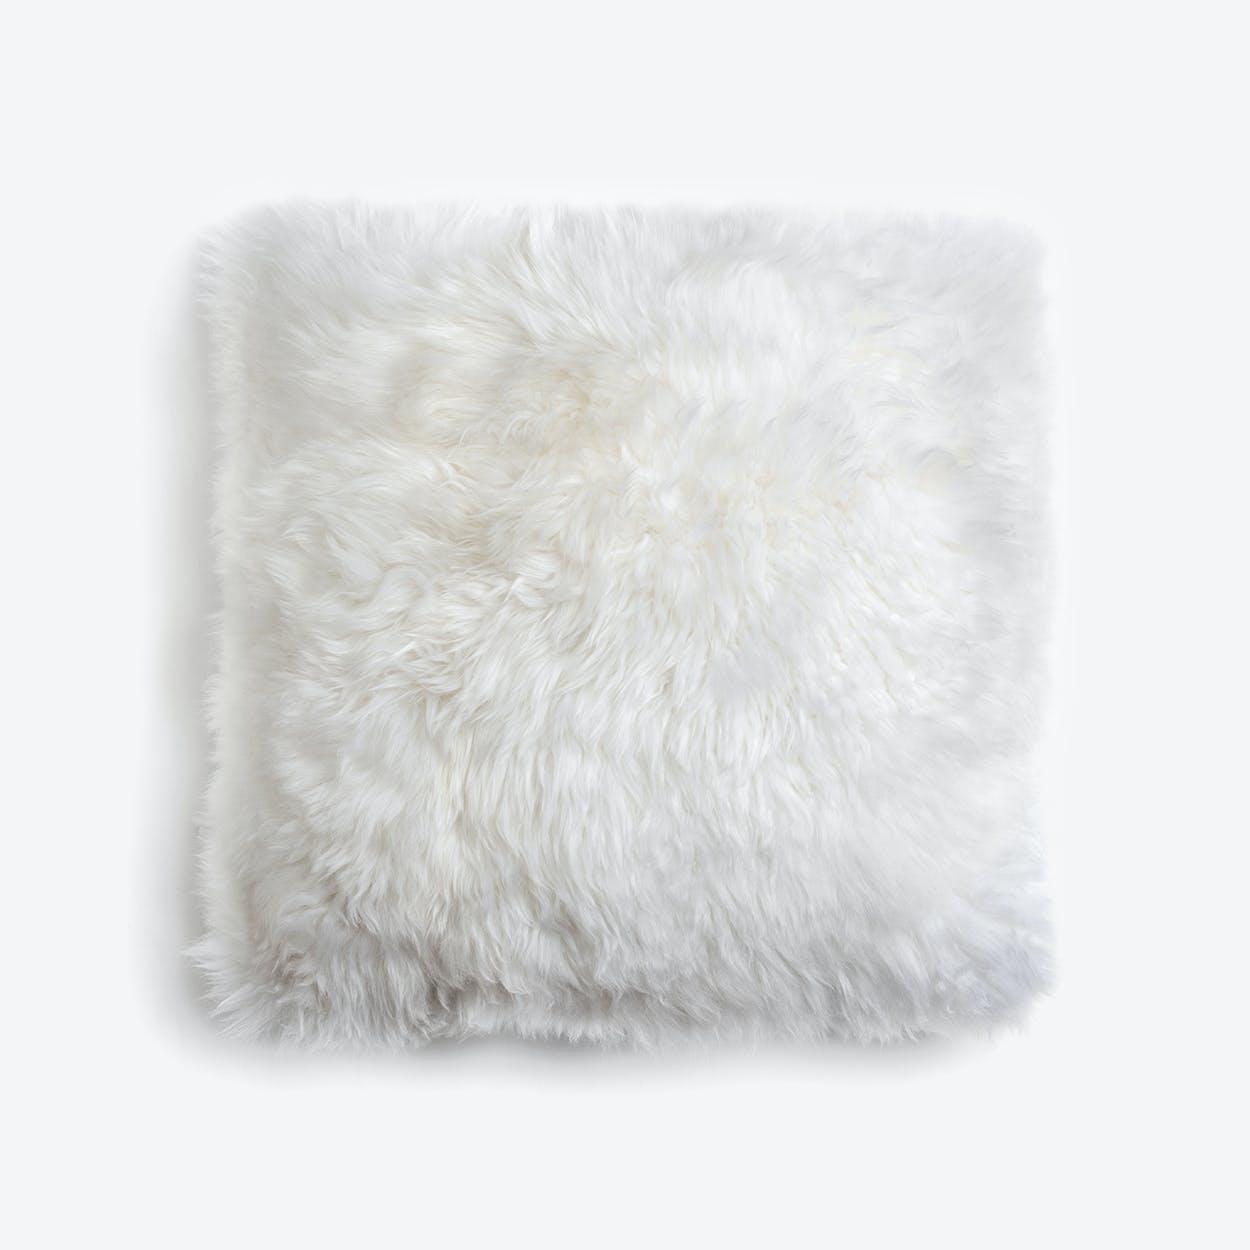 New Zealand Sheepskin Cushion in Natural White